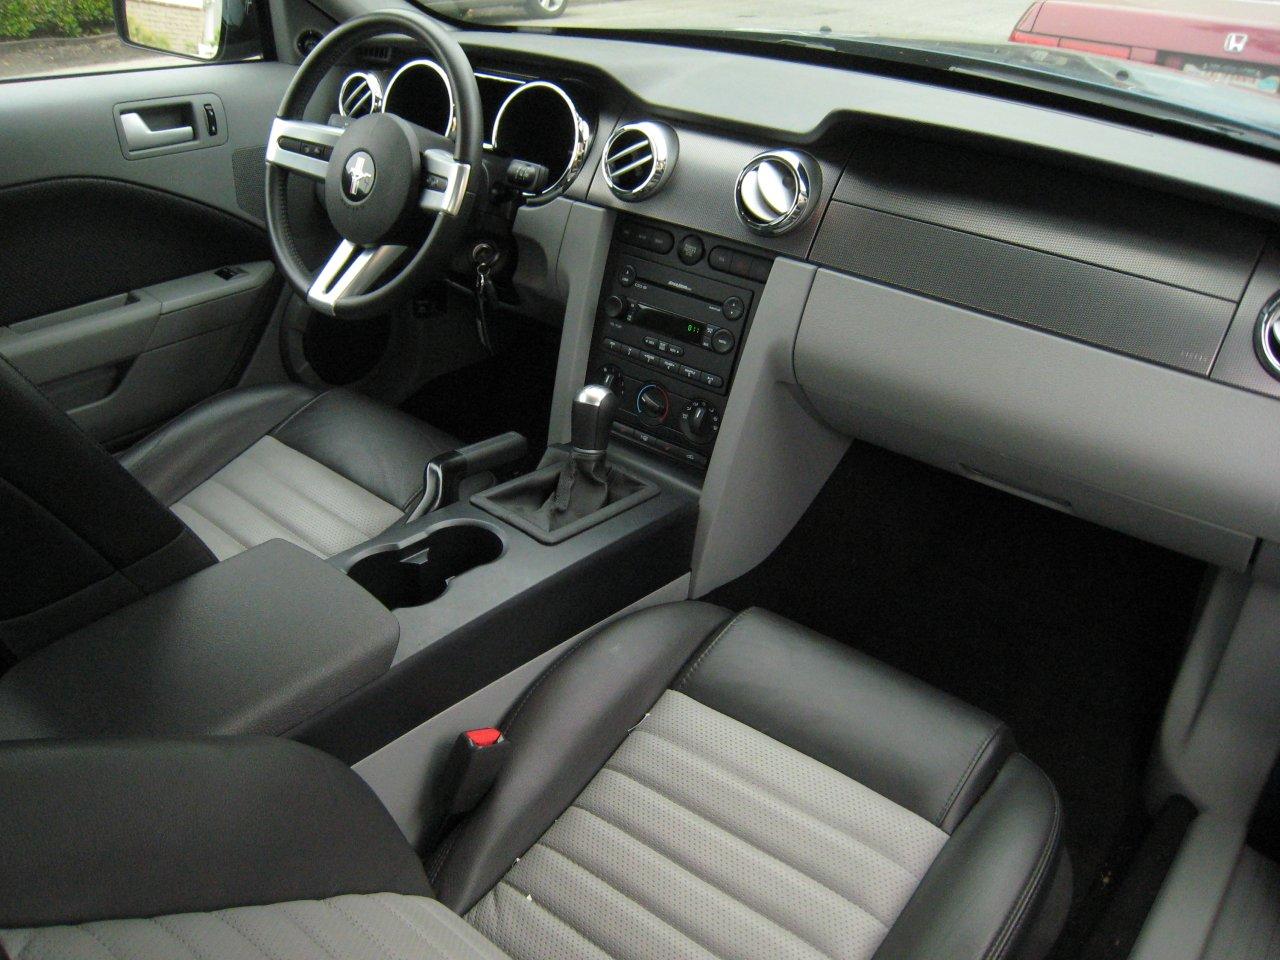 Sherlington 39 s car tutorial minecraft blog for 2005 ford mustang convertible interior